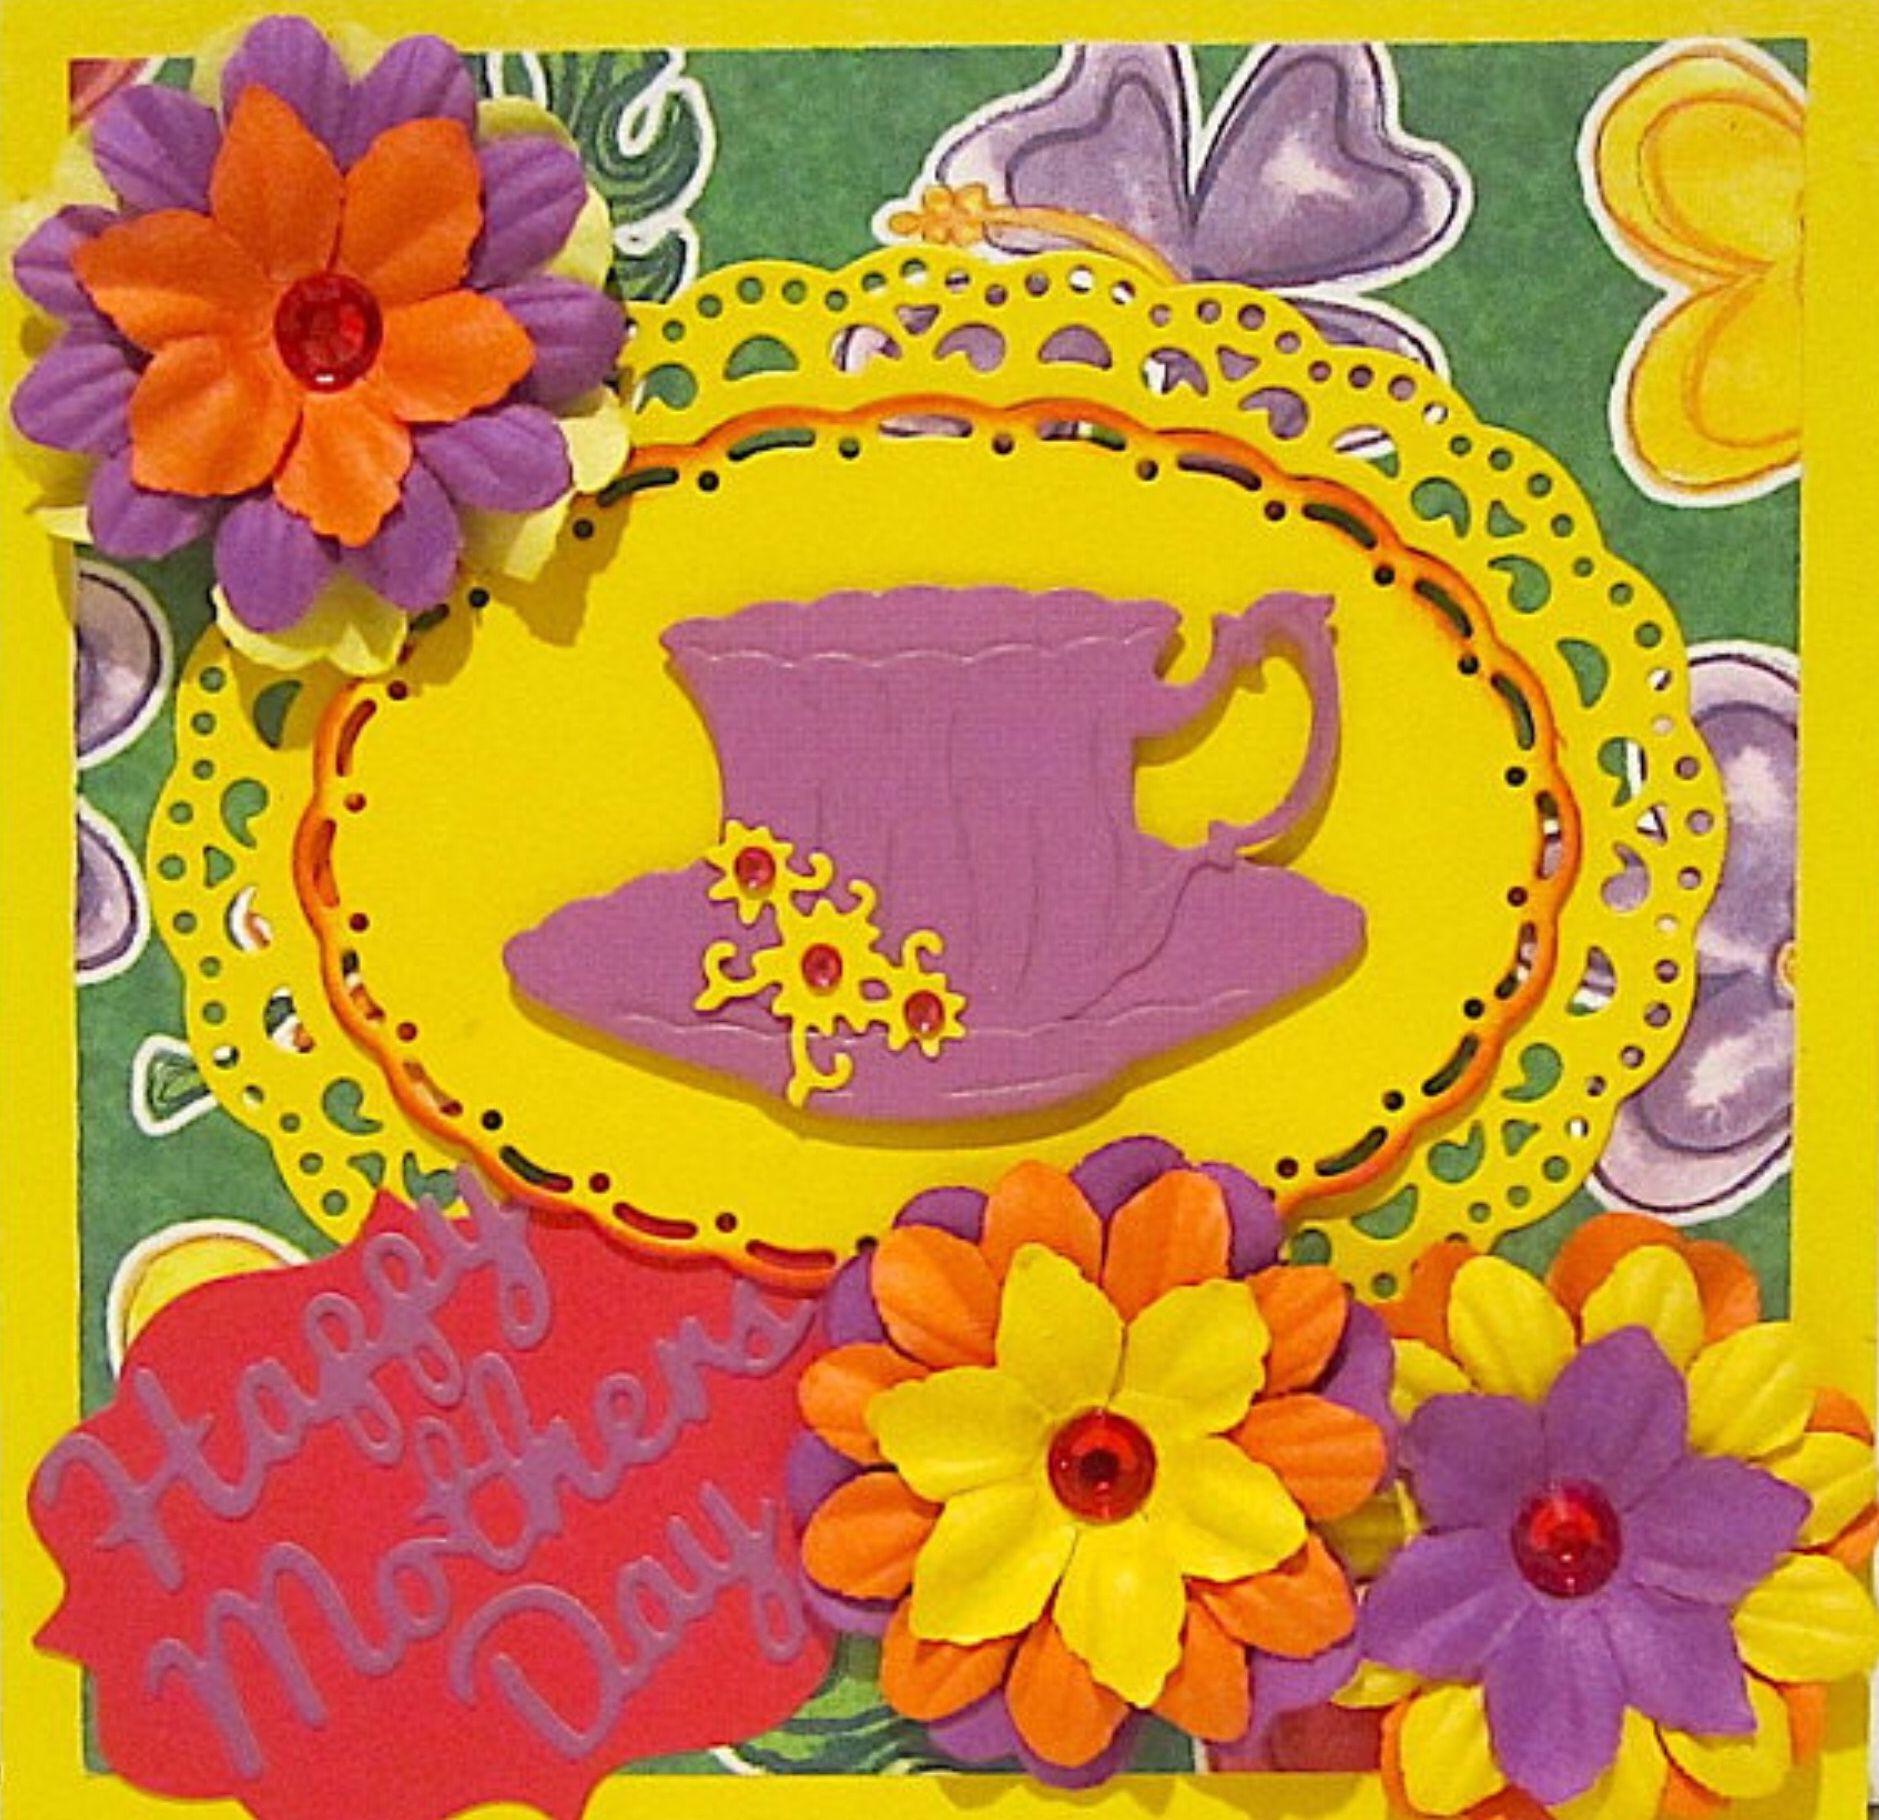 Motherus day cardhomemade cardshandmade cardscottage cutz cards